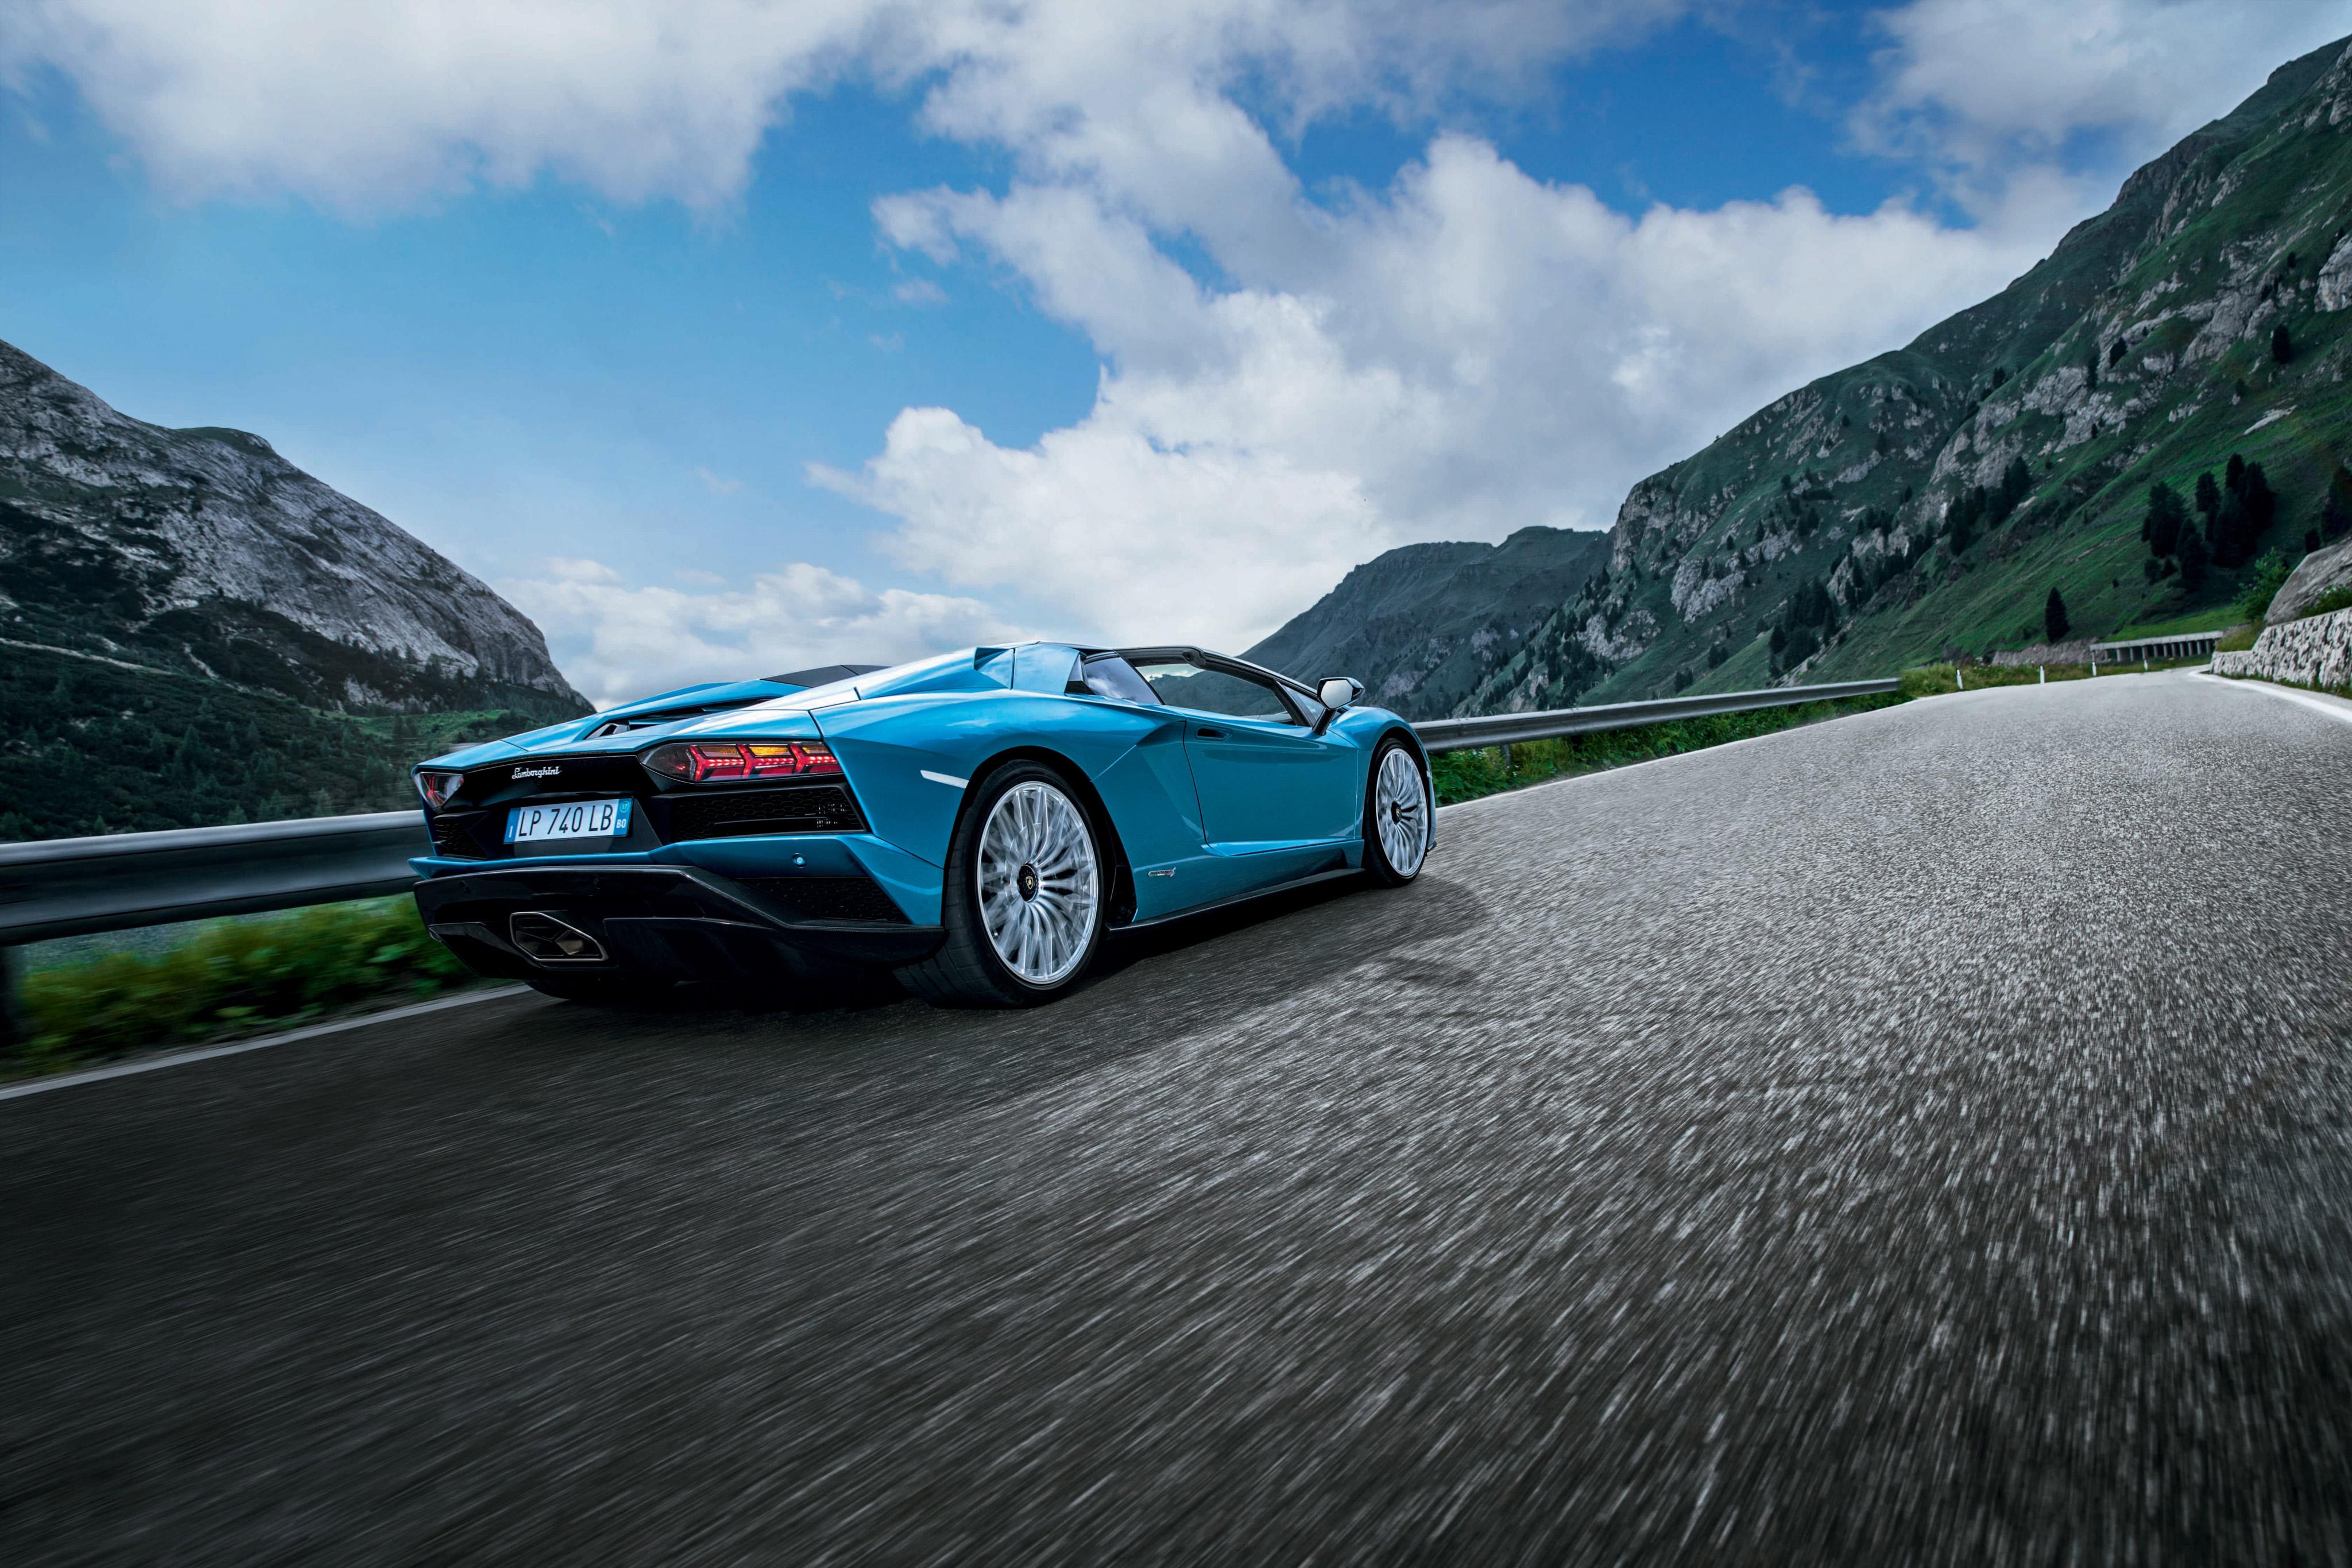 Lamborghini Aventador S Roadster 2017 4k, HD Cars, 4k